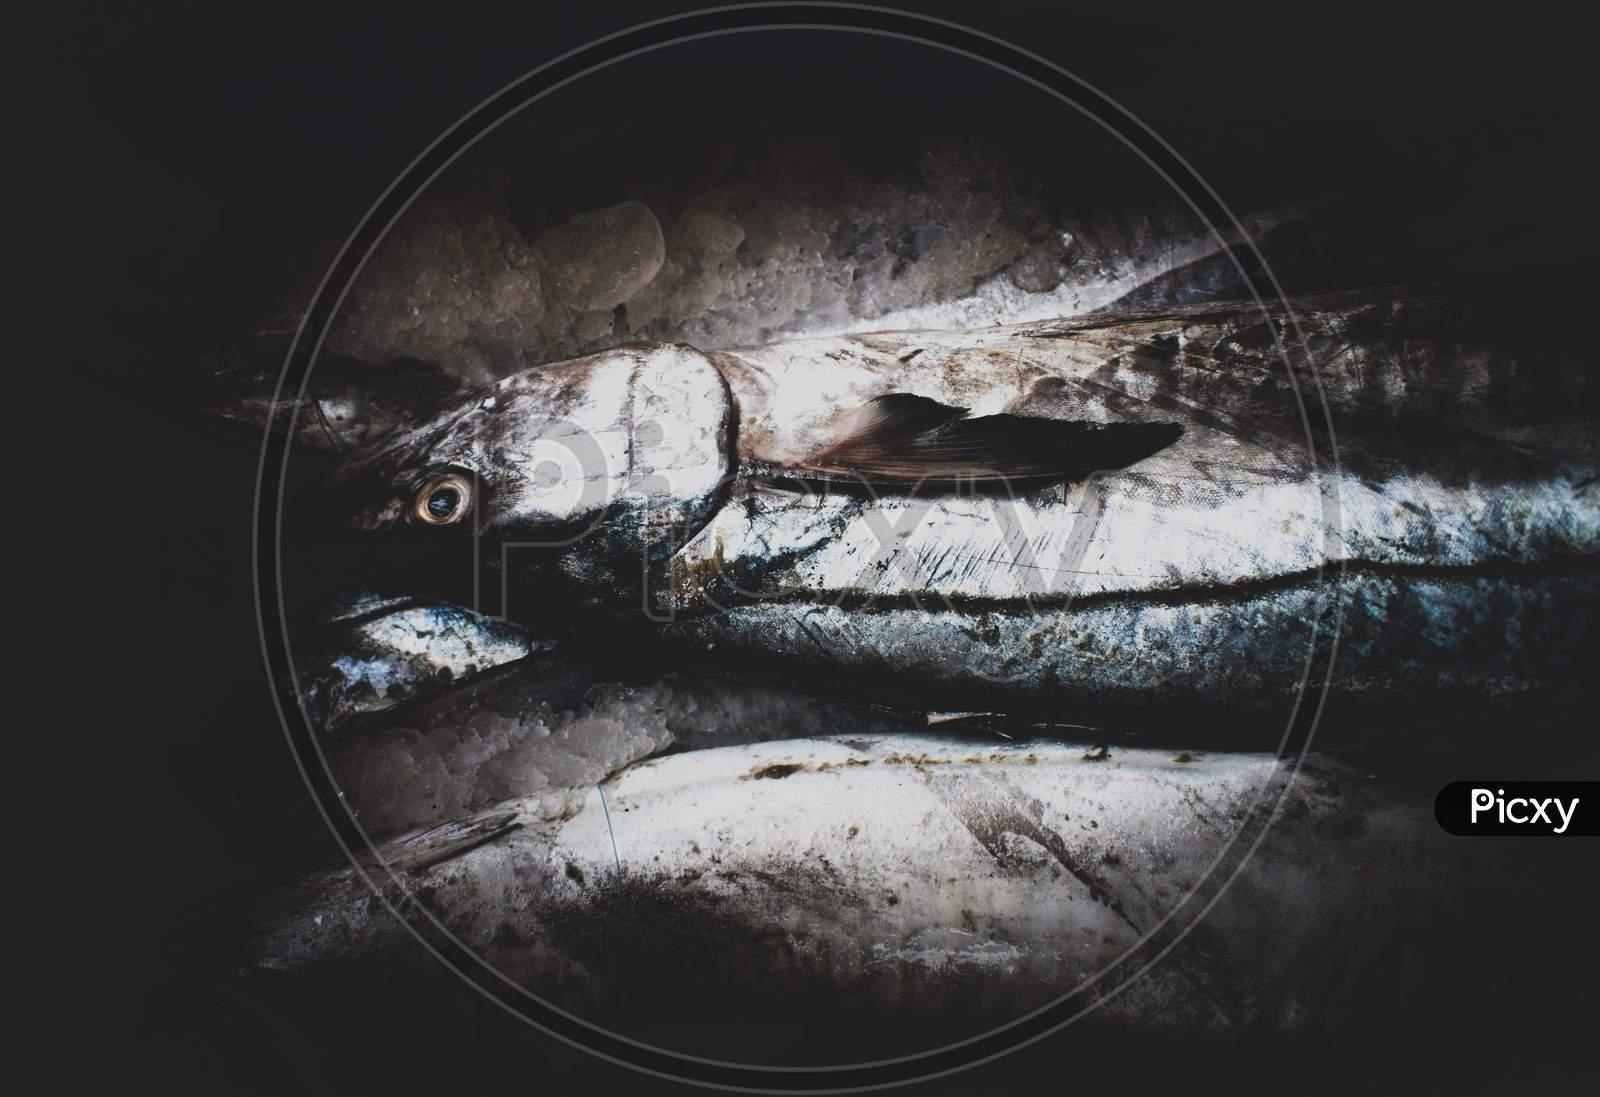 King Mackerel Fish Kept On Ice With Dark Background.